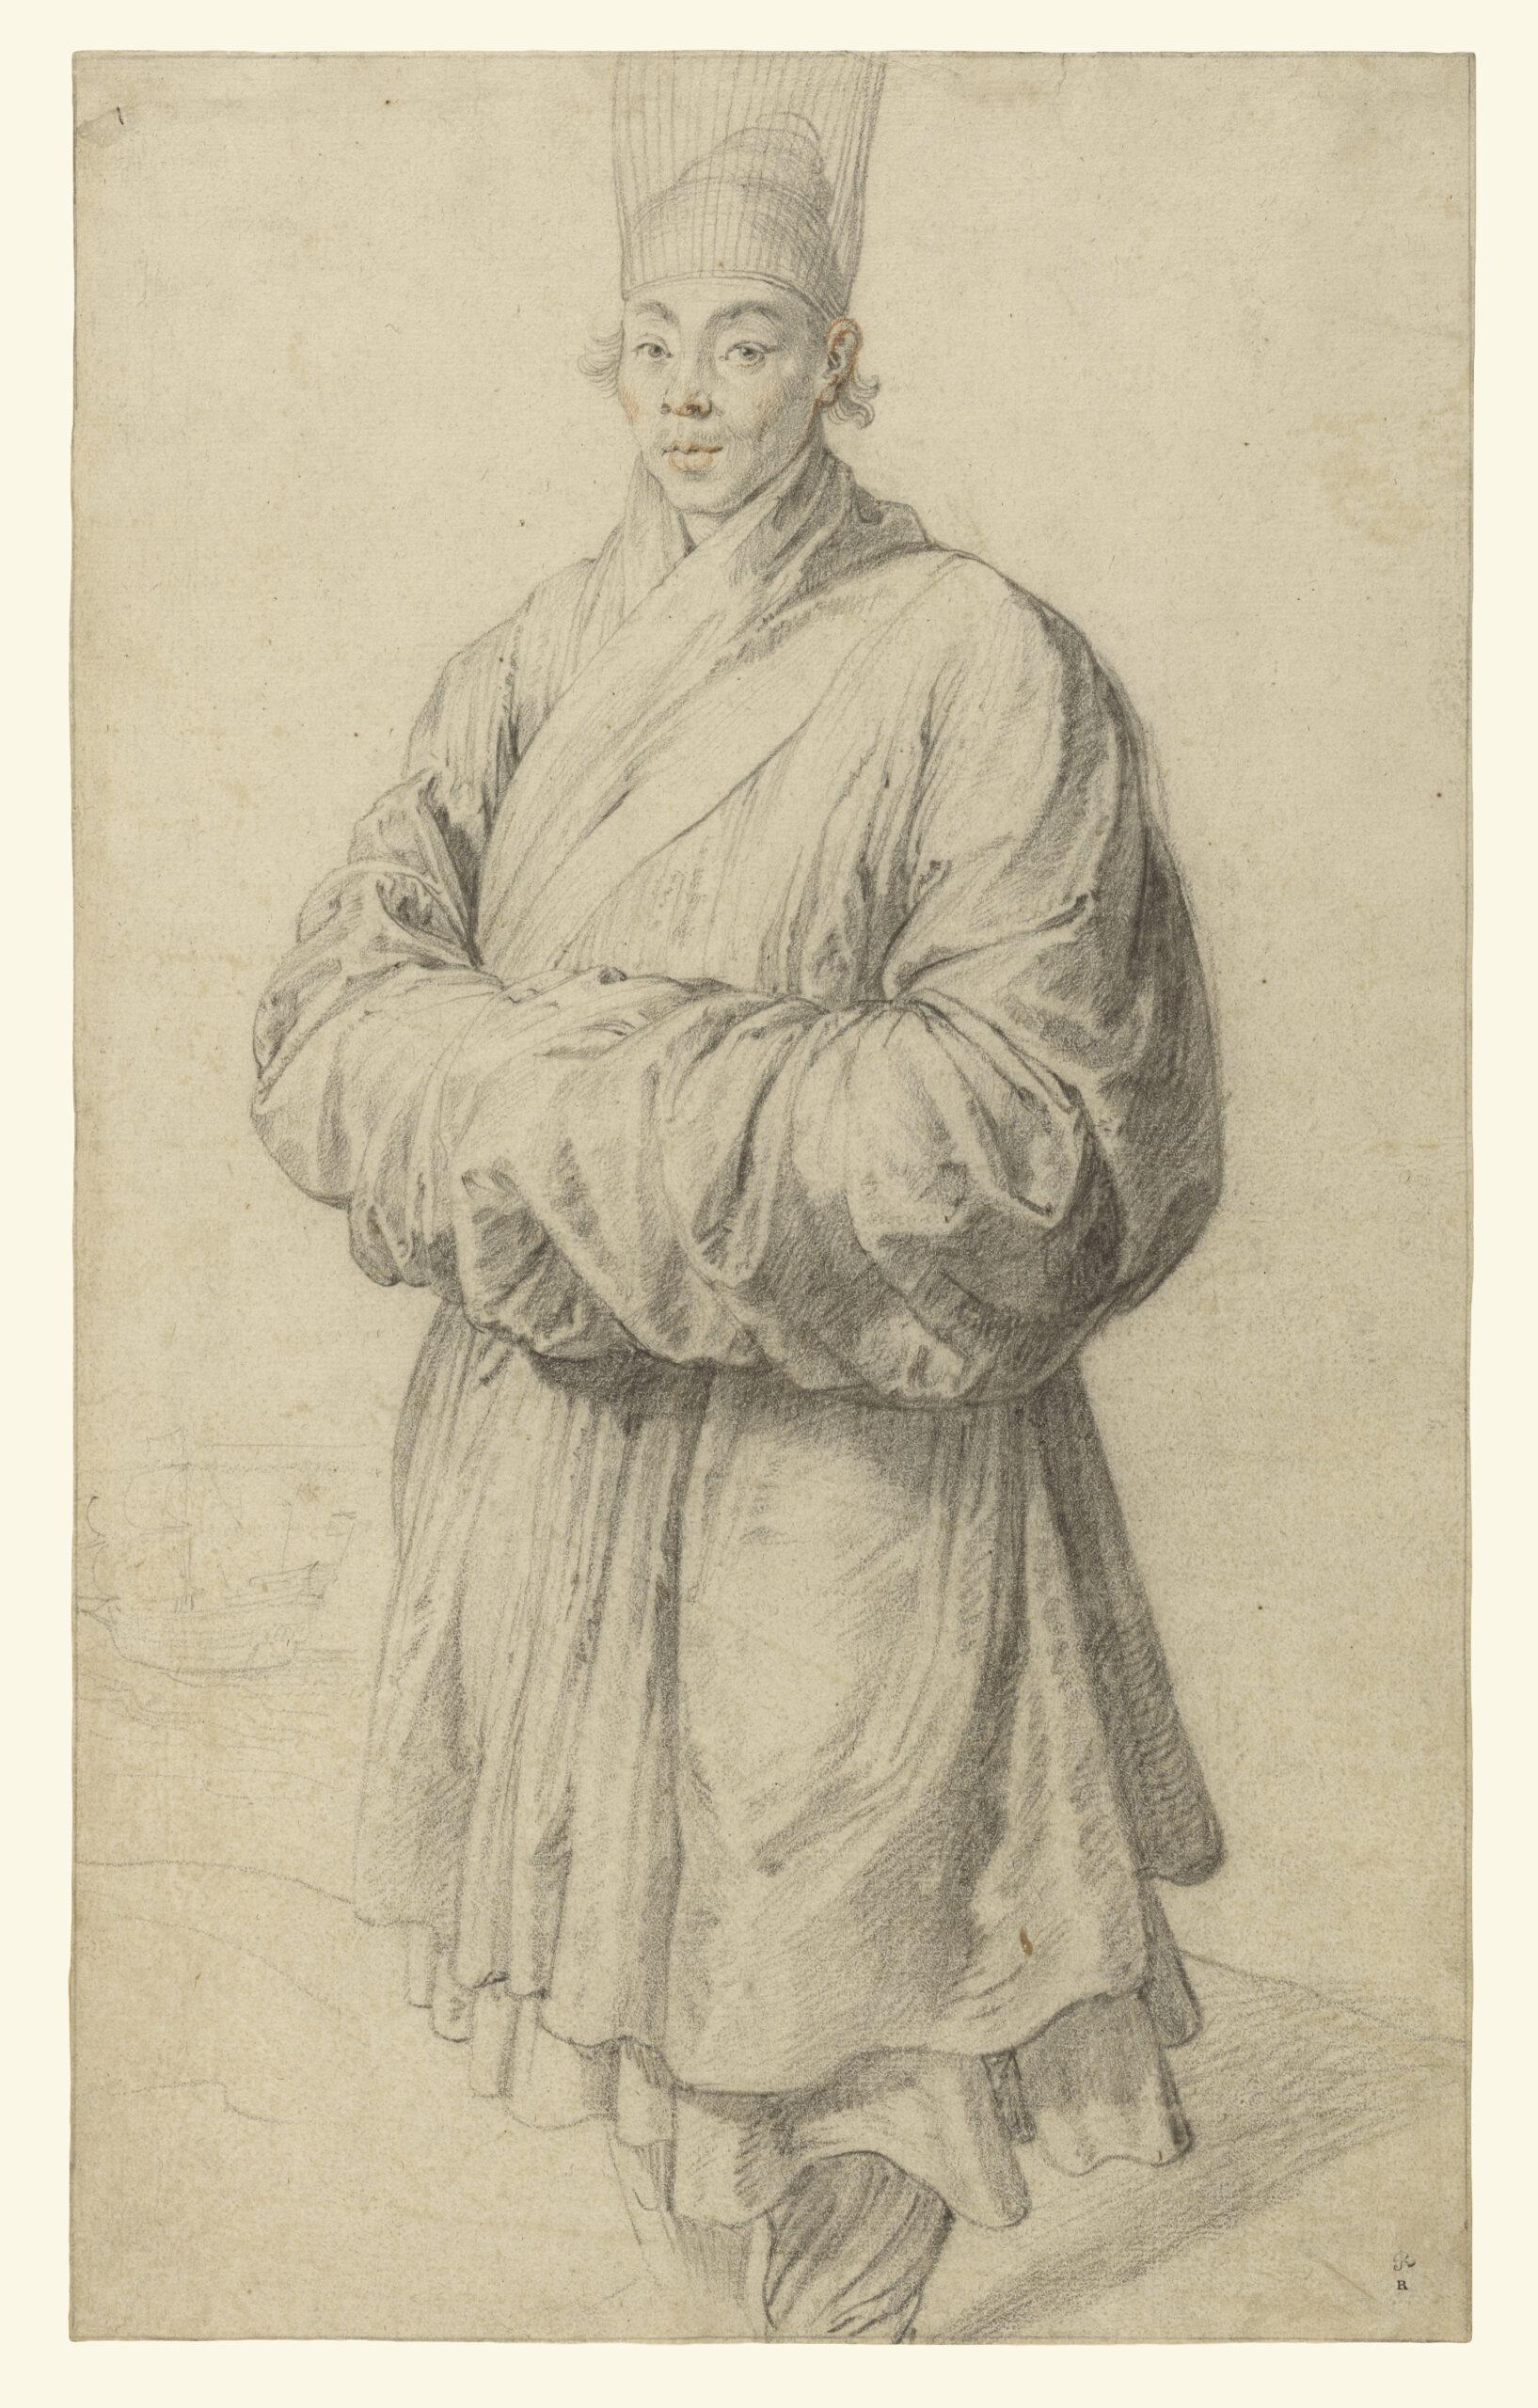 Peter Paul Rubens (1577-1640), <em>Man in Korean Costume</em>, ca. 1617<br>J. Paul Getty Museum, Los Angeles (83.GB.384)